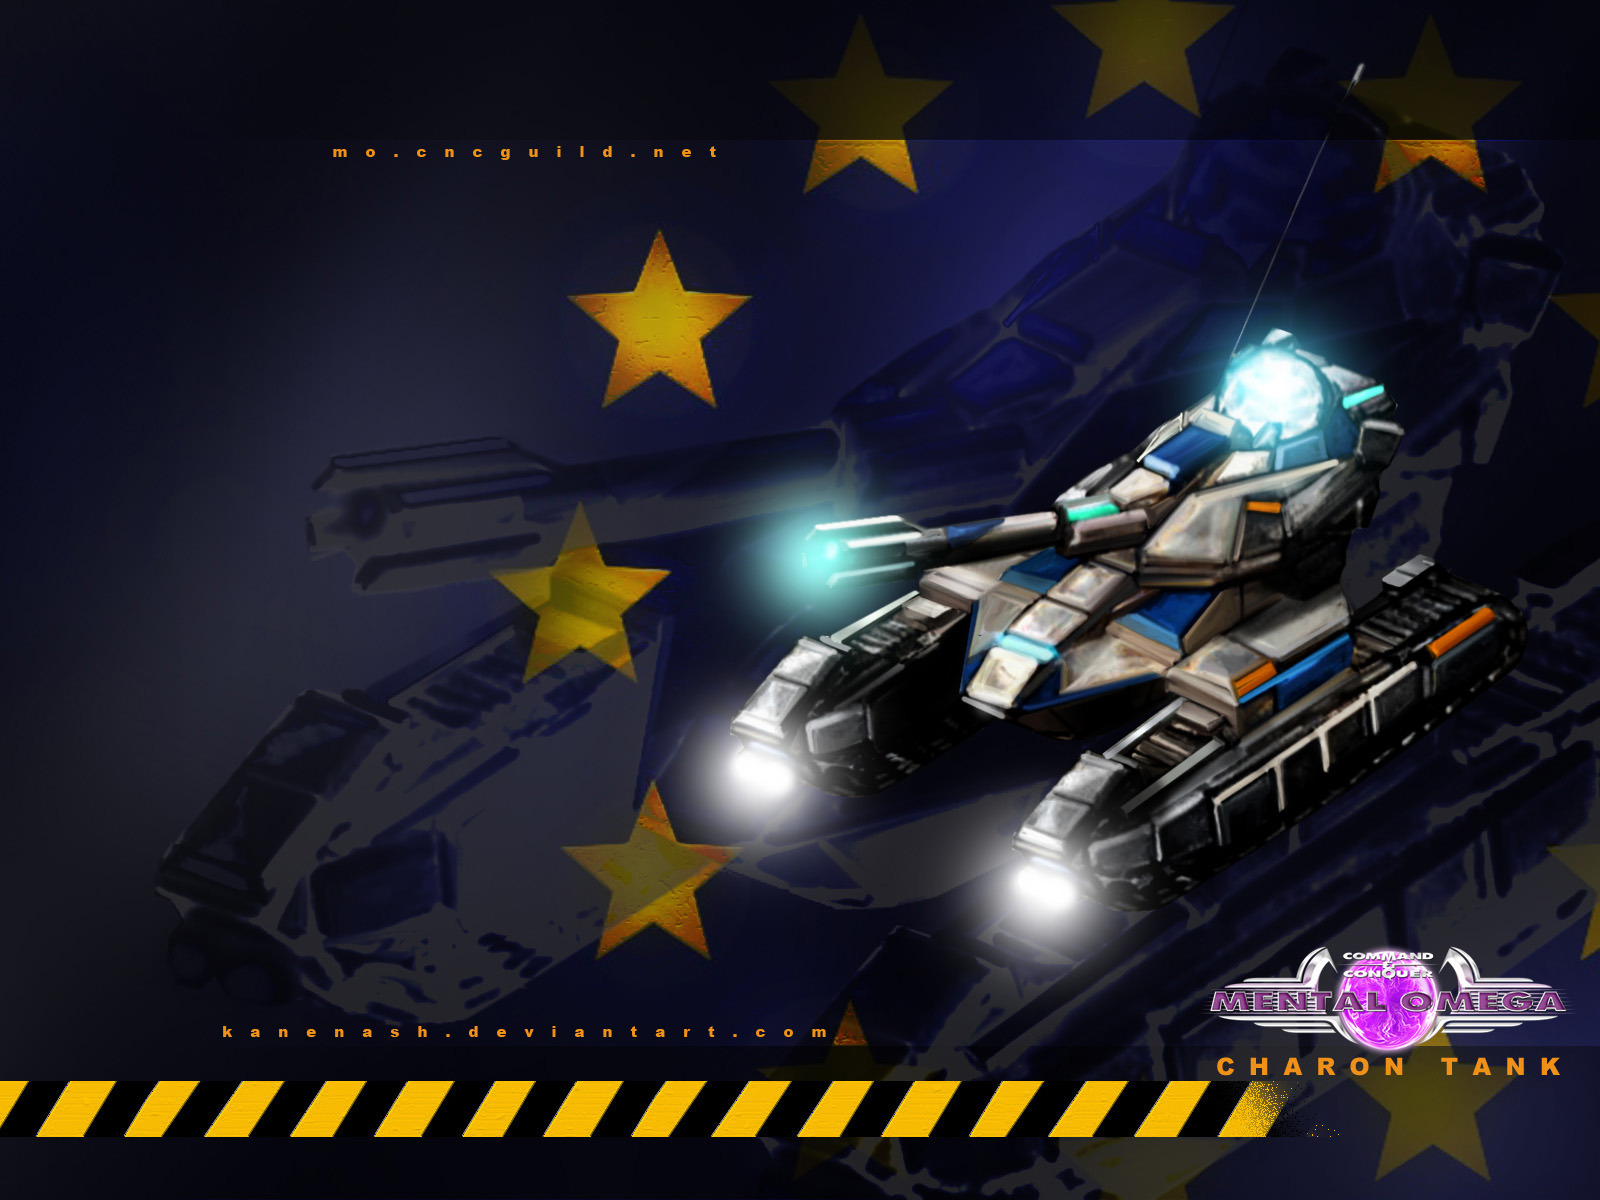 Allied Charon Chrono Tank by KaneNash